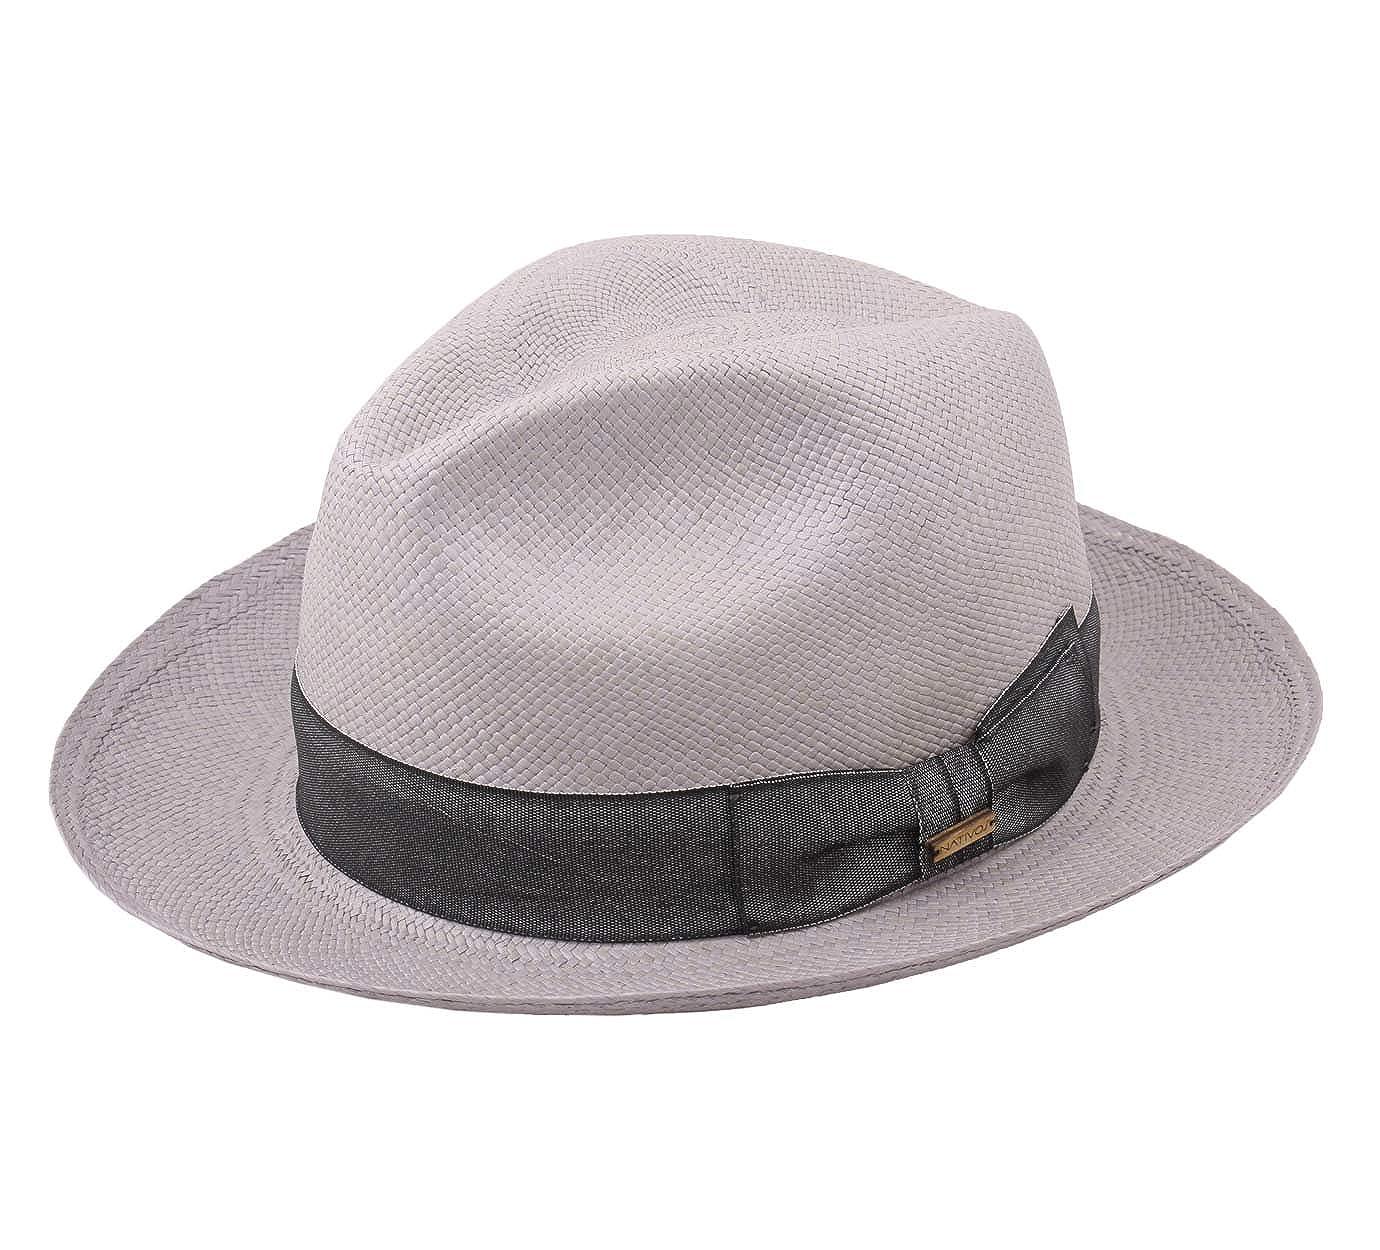 Nativos Cavaliere Panama Hat